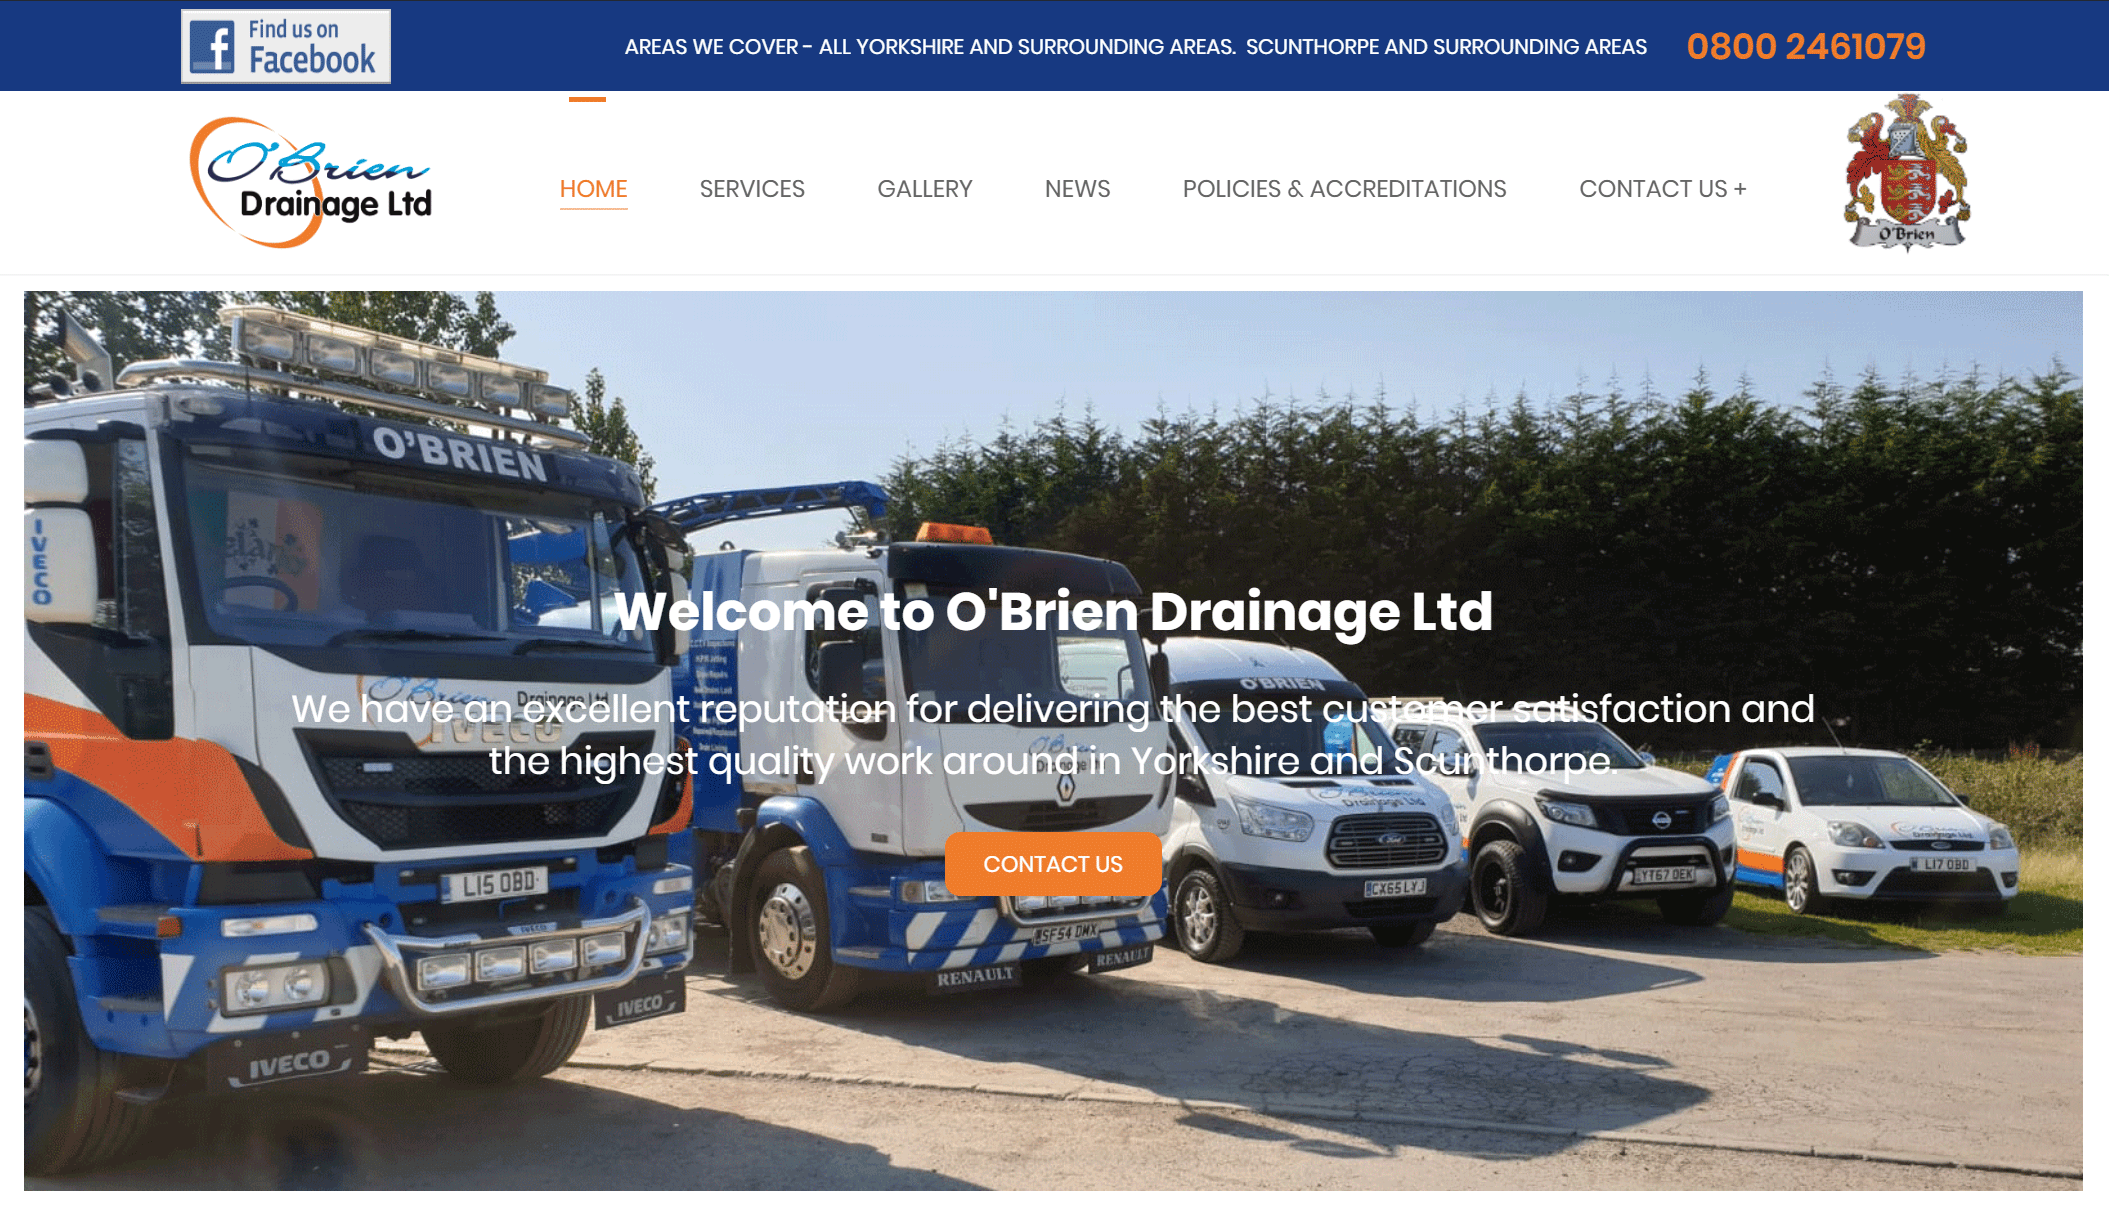 O'Brien Drainage